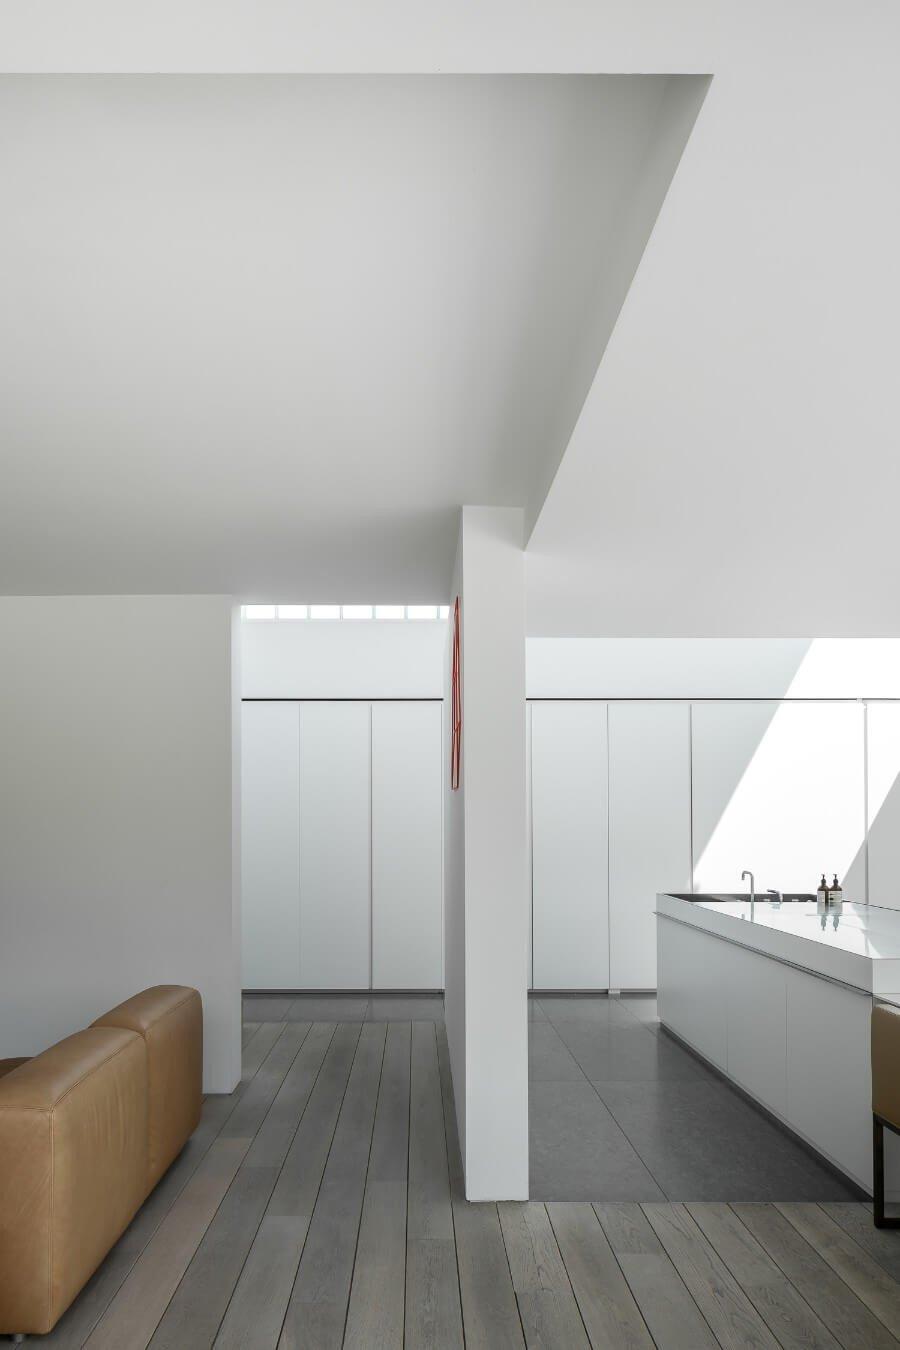 House-MP-Rietveldprojects-Photobycafeine-46